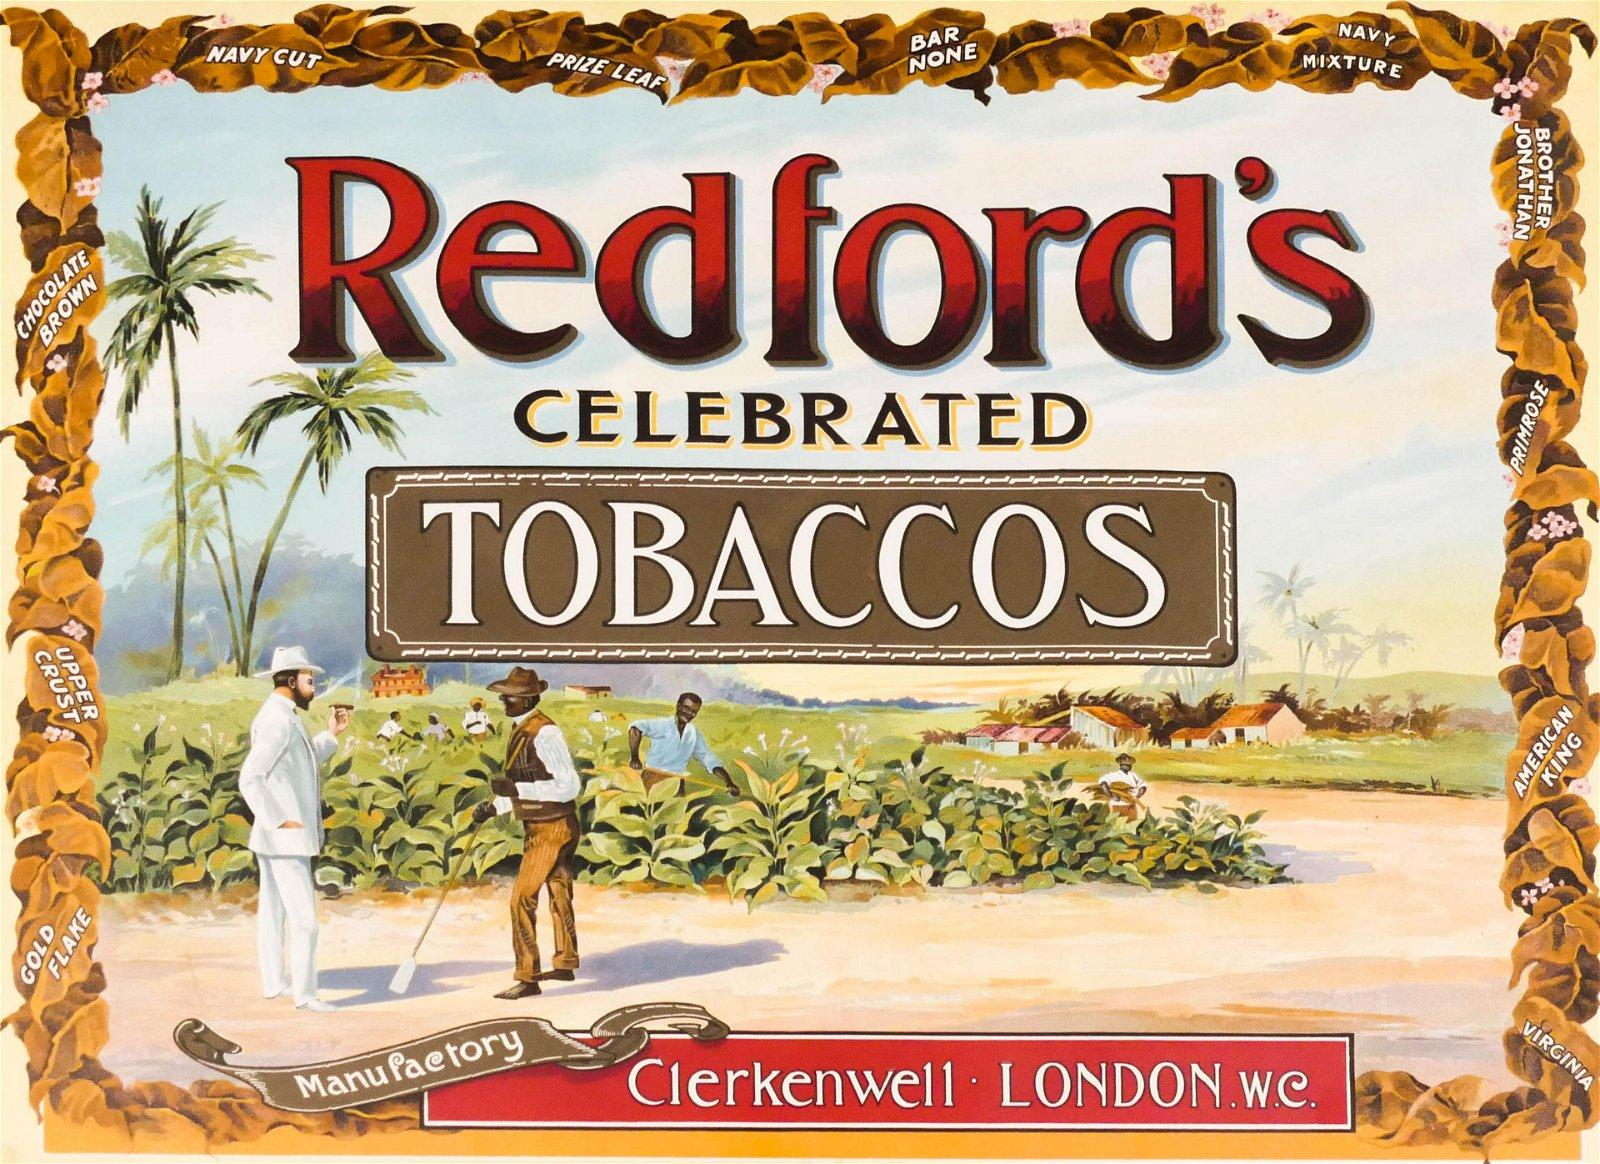 Antique Redford's Tobacco Black Americana Advertising